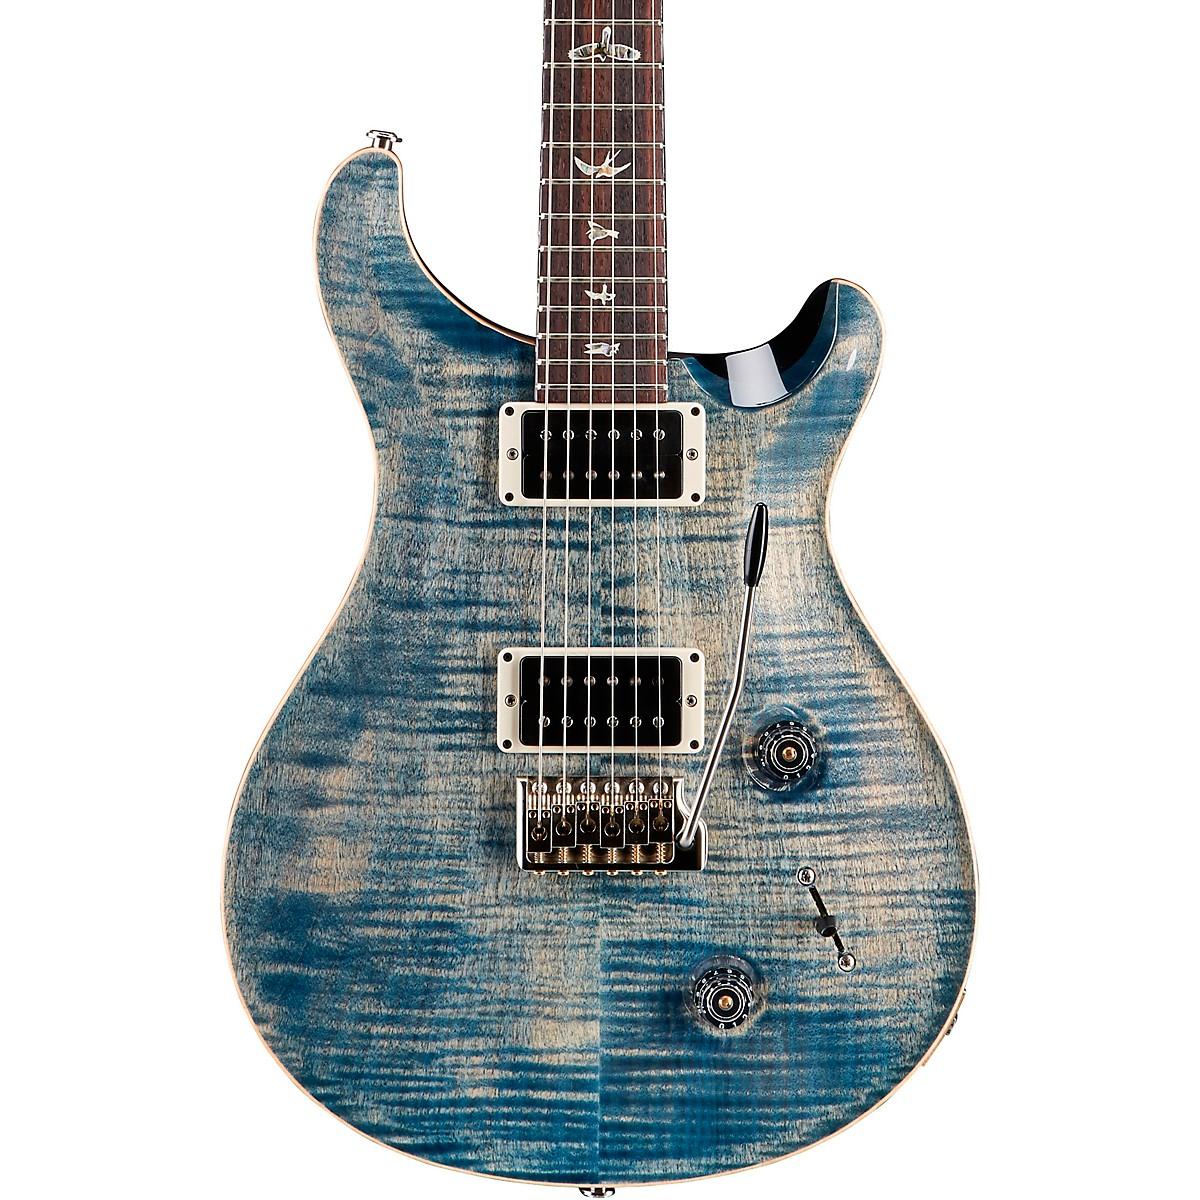 PRS Custom 22 Carved Figured Maple Top with Gen 3 Tremolo Bridge Solid Body Electric Guitar